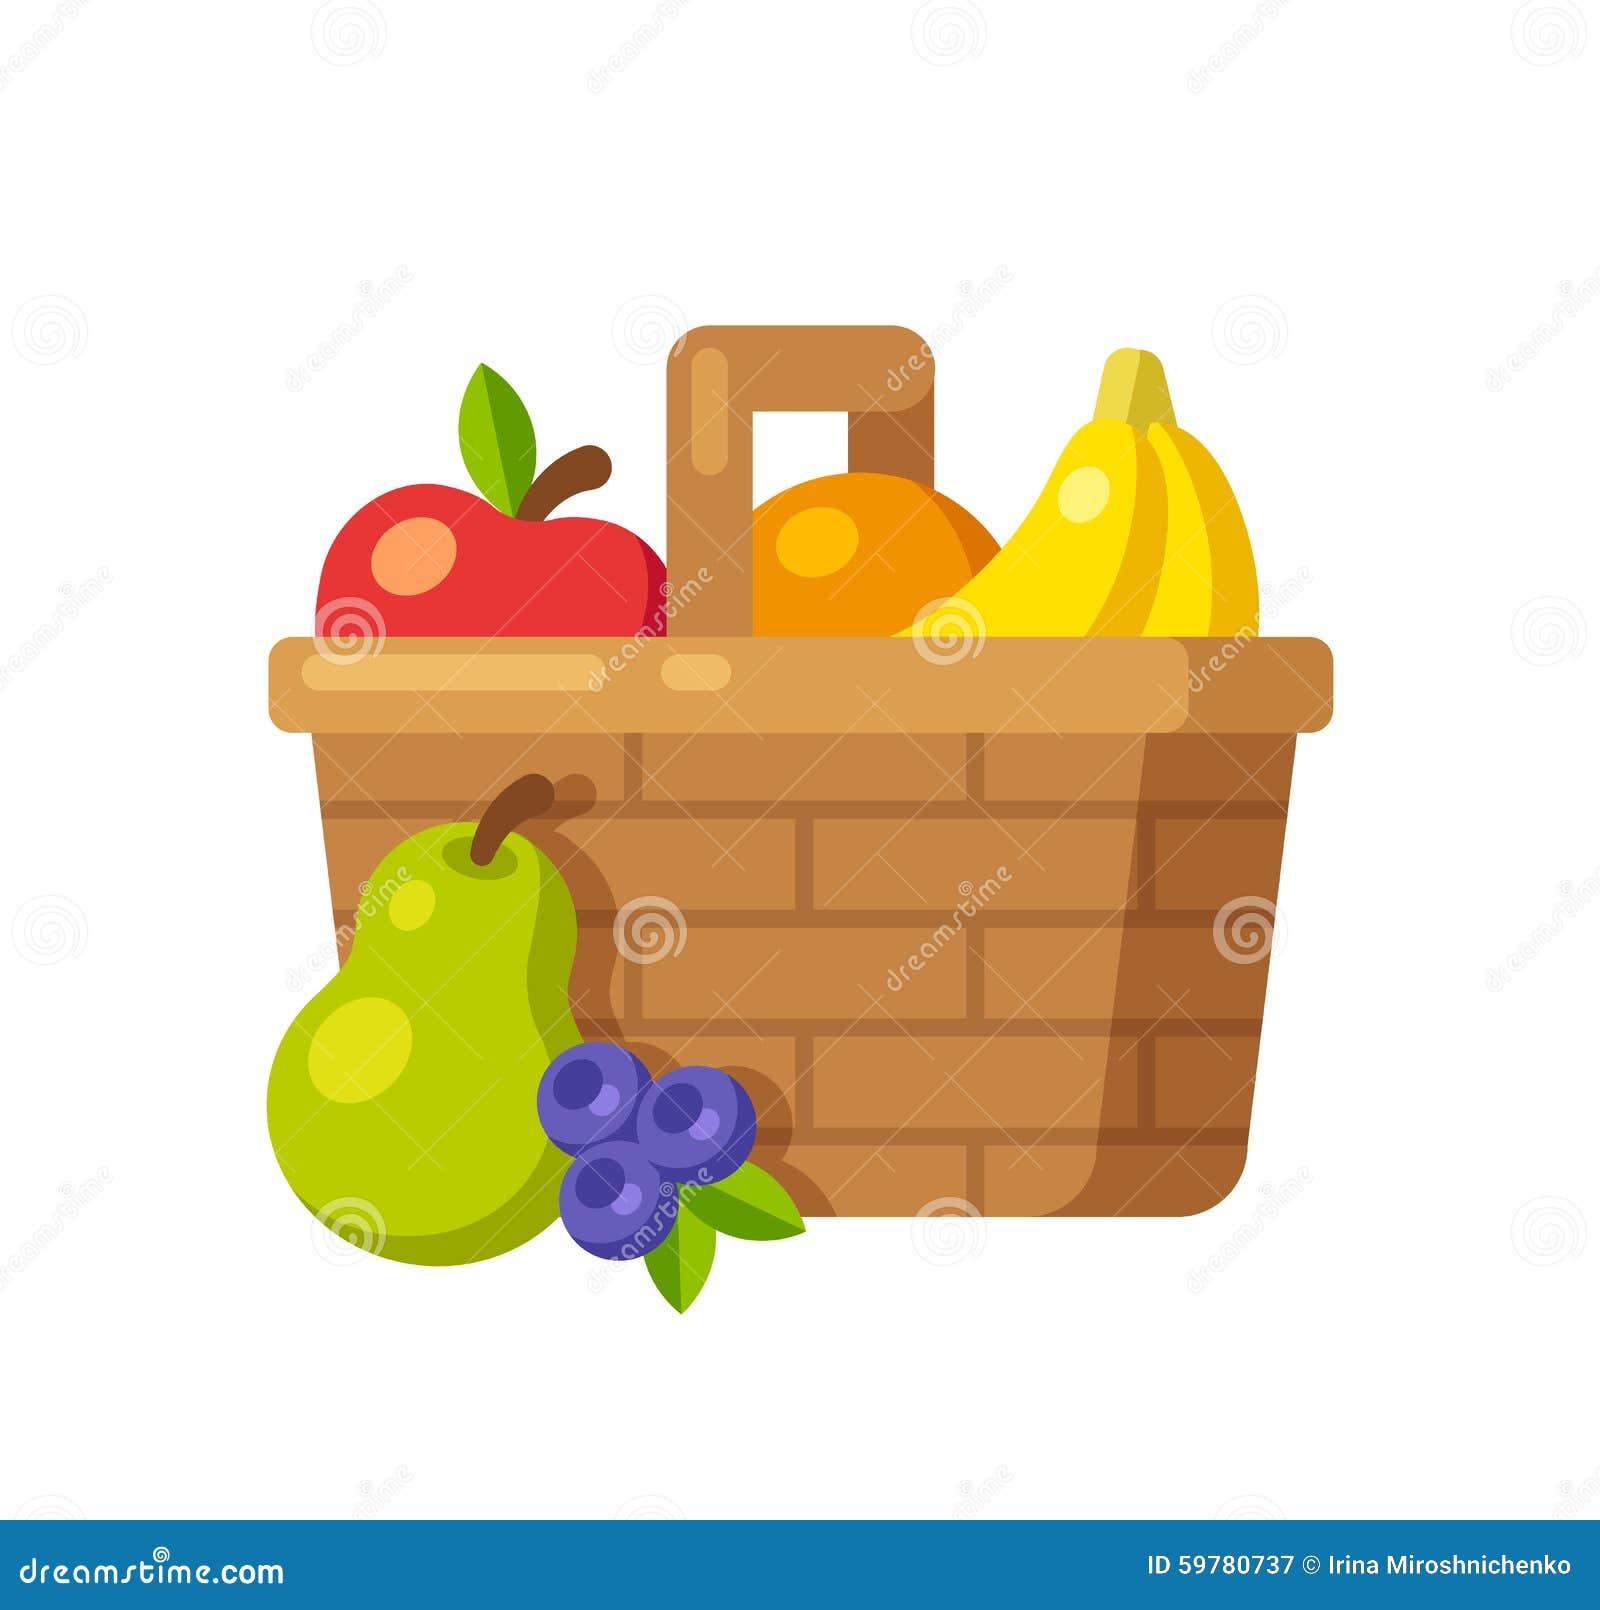 Basket Cartoons, Illustrations & Vector Stock Images